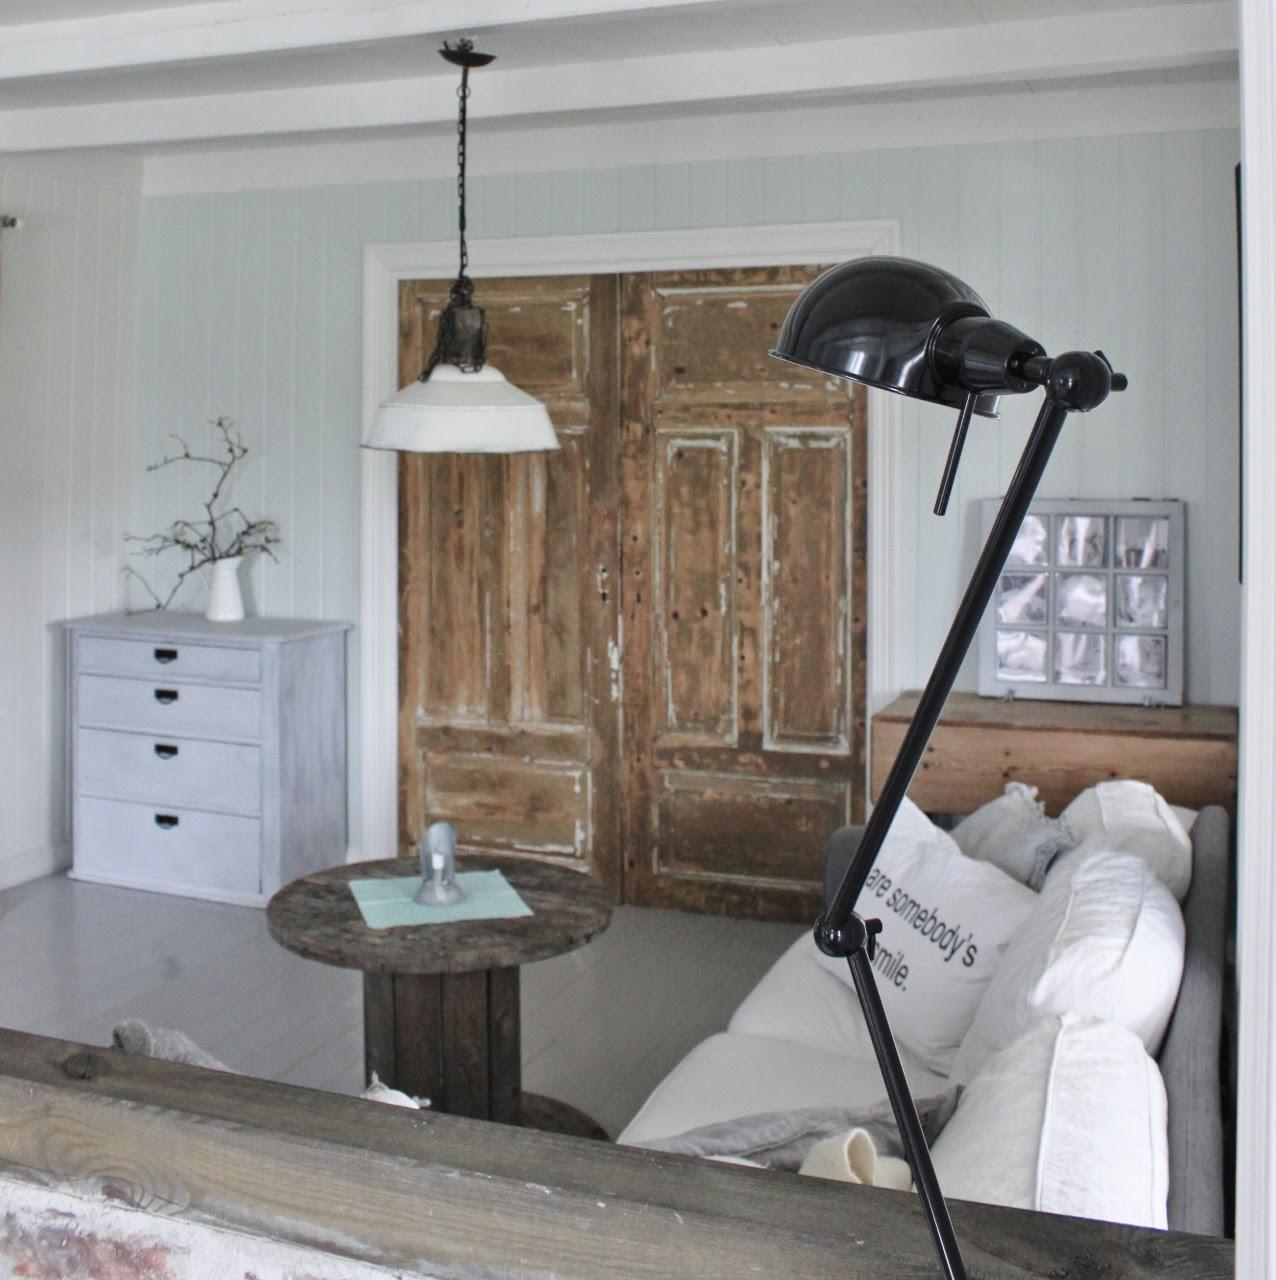 mias interi r new room interior interi rkonsulent maria rasmussen ny lampe. Black Bedroom Furniture Sets. Home Design Ideas